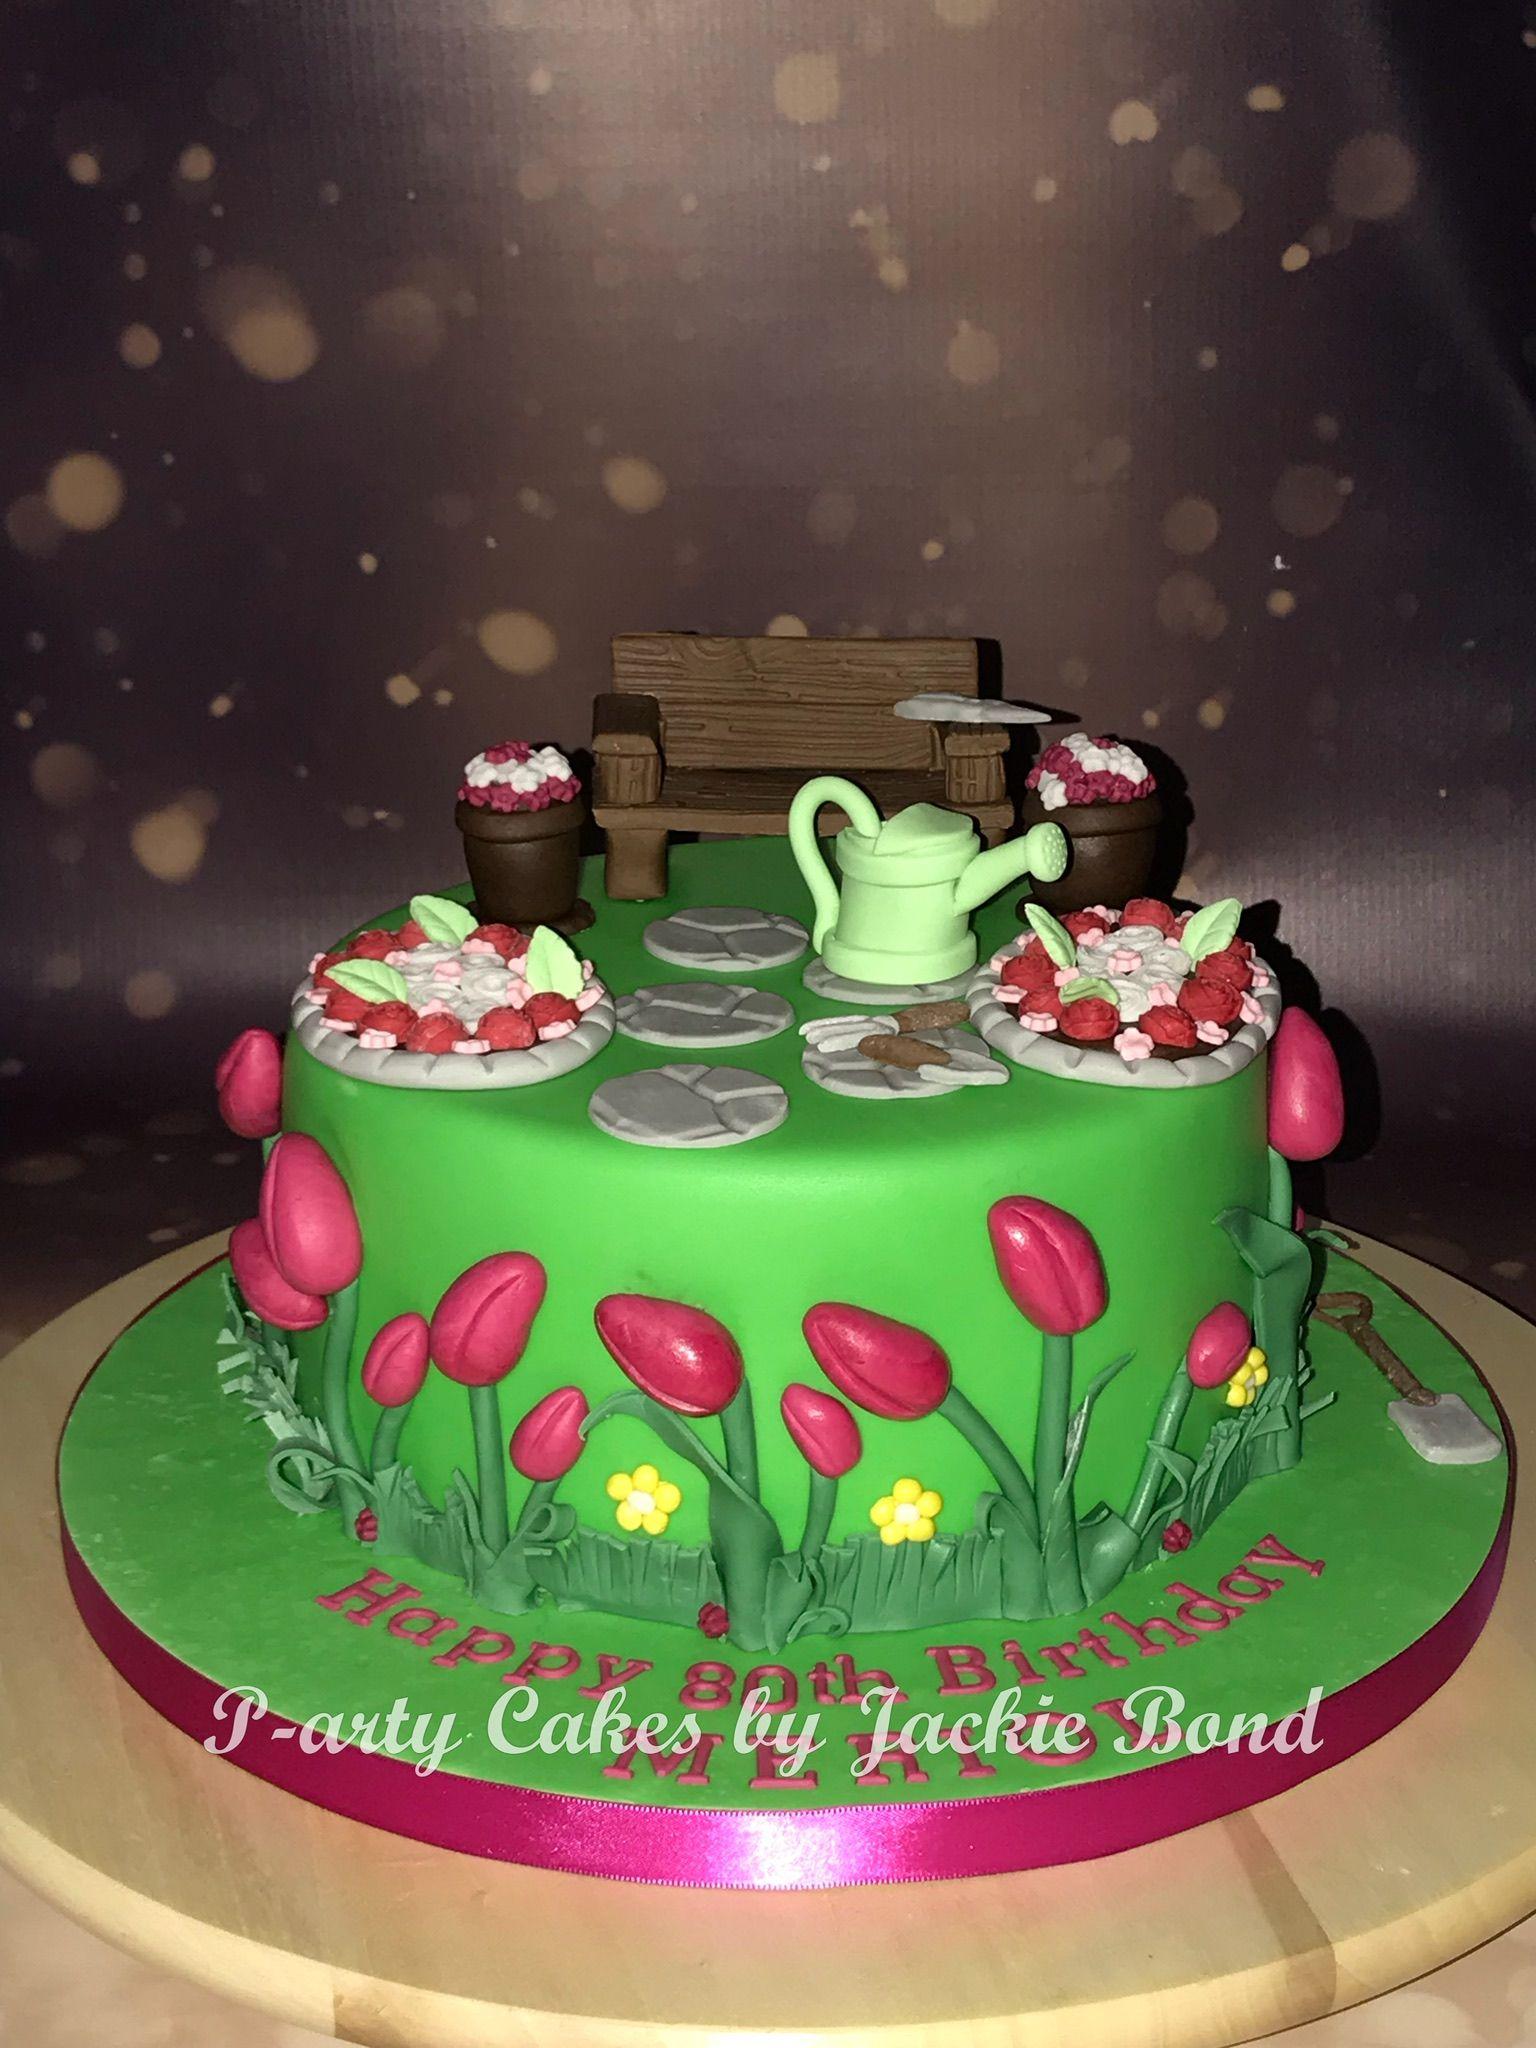 Gardening themed 80th birthday cake My homemade cakes